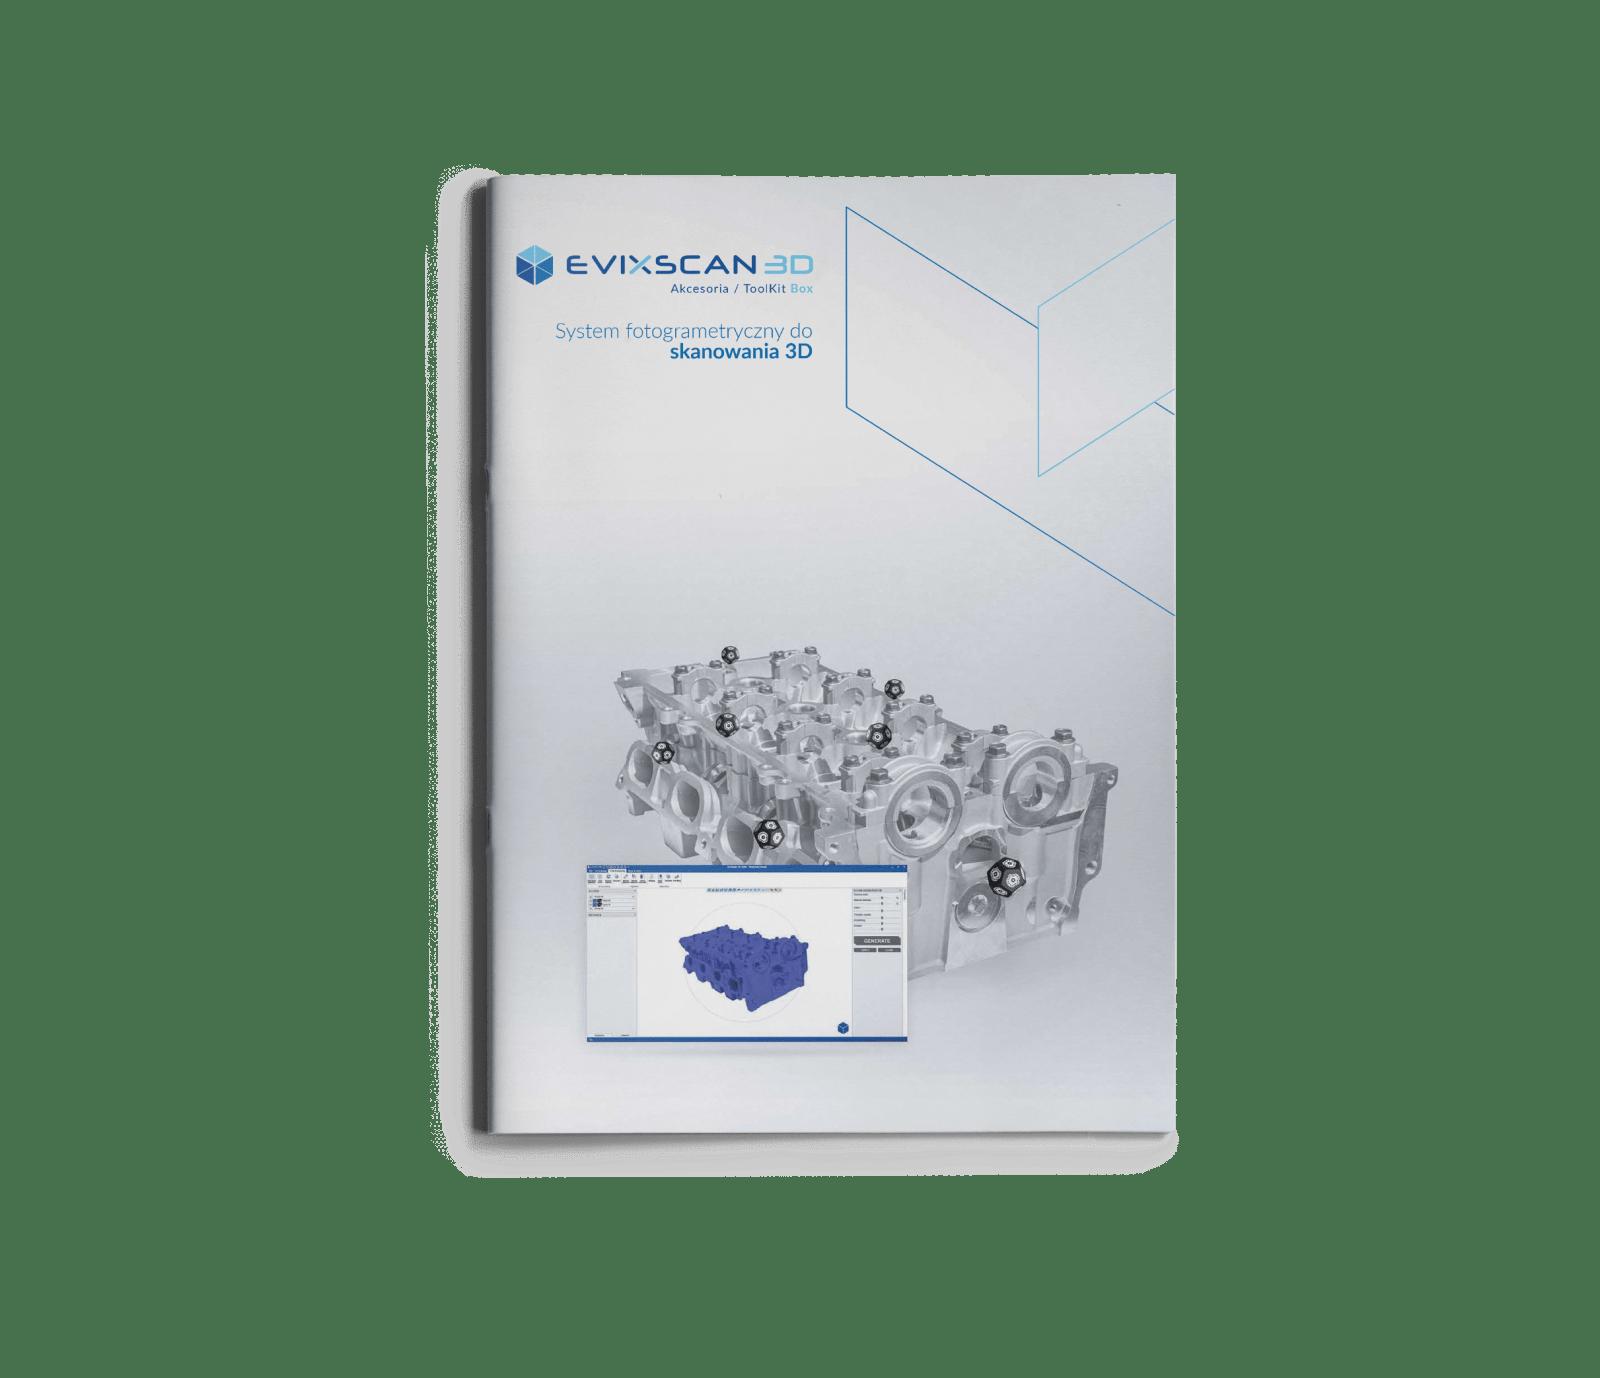 evixscan 3d foldery reklamowe (6)